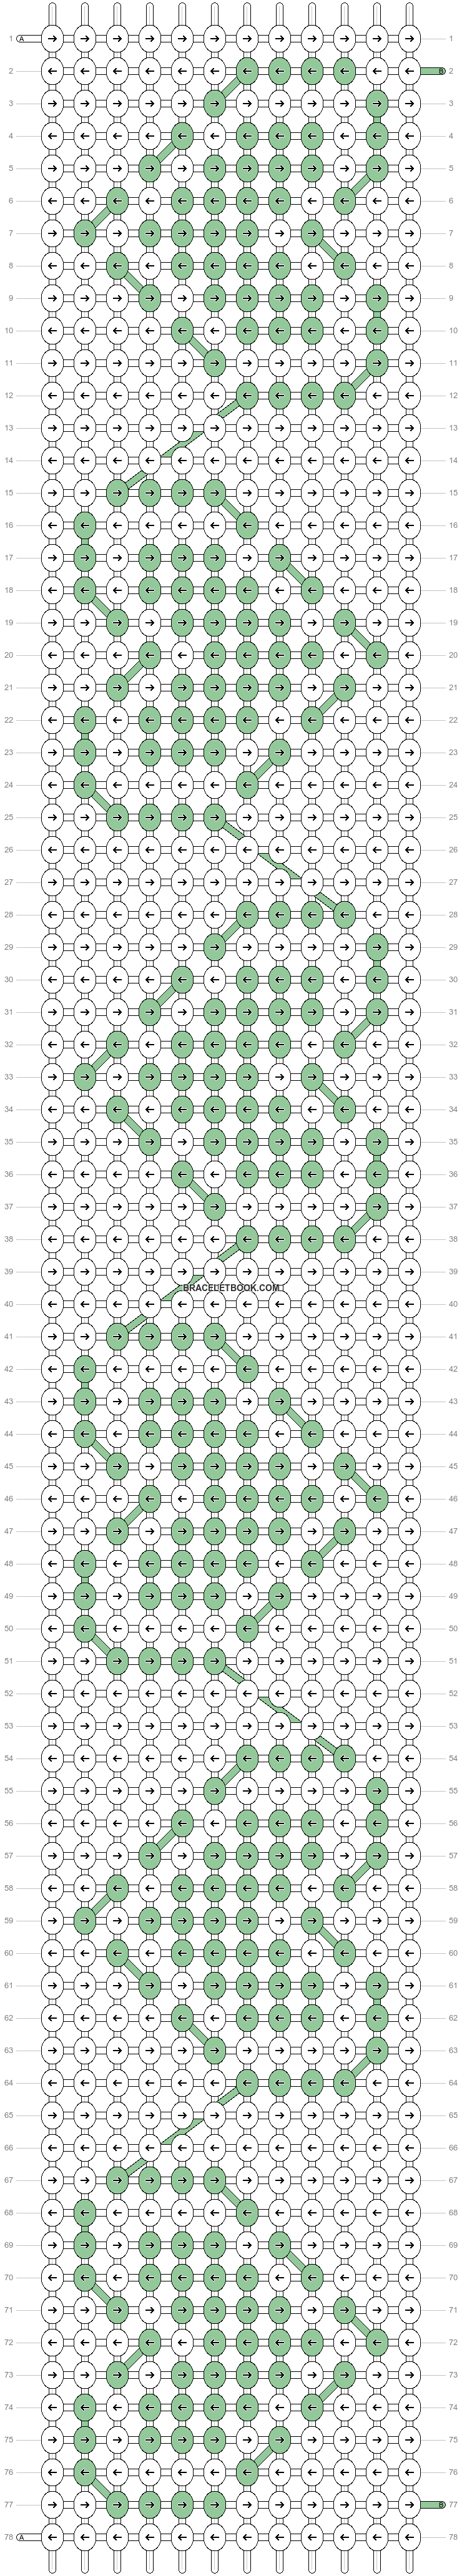 Alpha pattern #73364 variation #144073 pattern